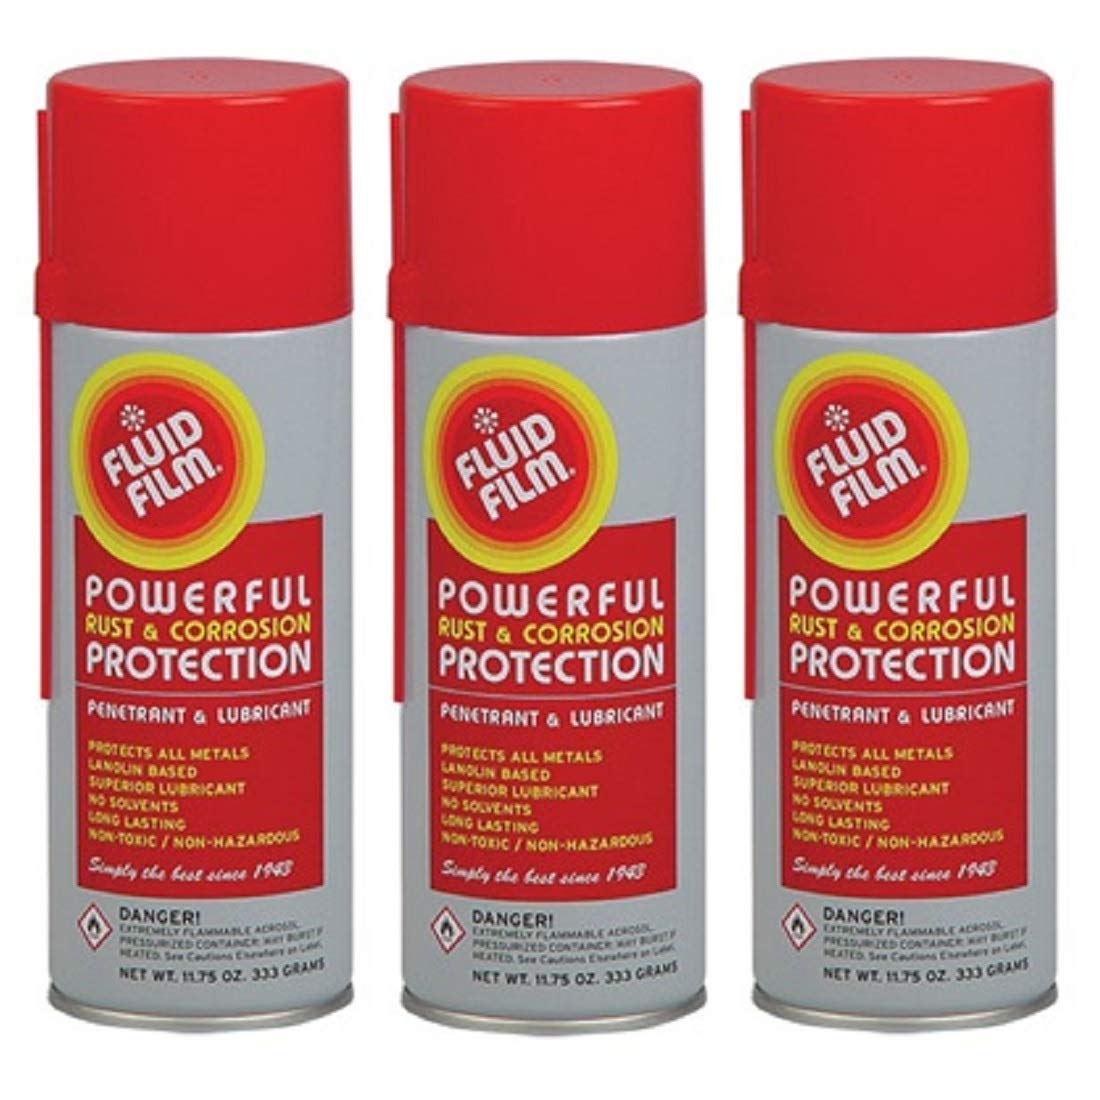 Fluid Film (3 Aerosol Cans) Rust & Corrosion Protection; Metal Surface Penetrant & Lubricant, Marine, Automotive, Industrial, Home, 11.75 Oz